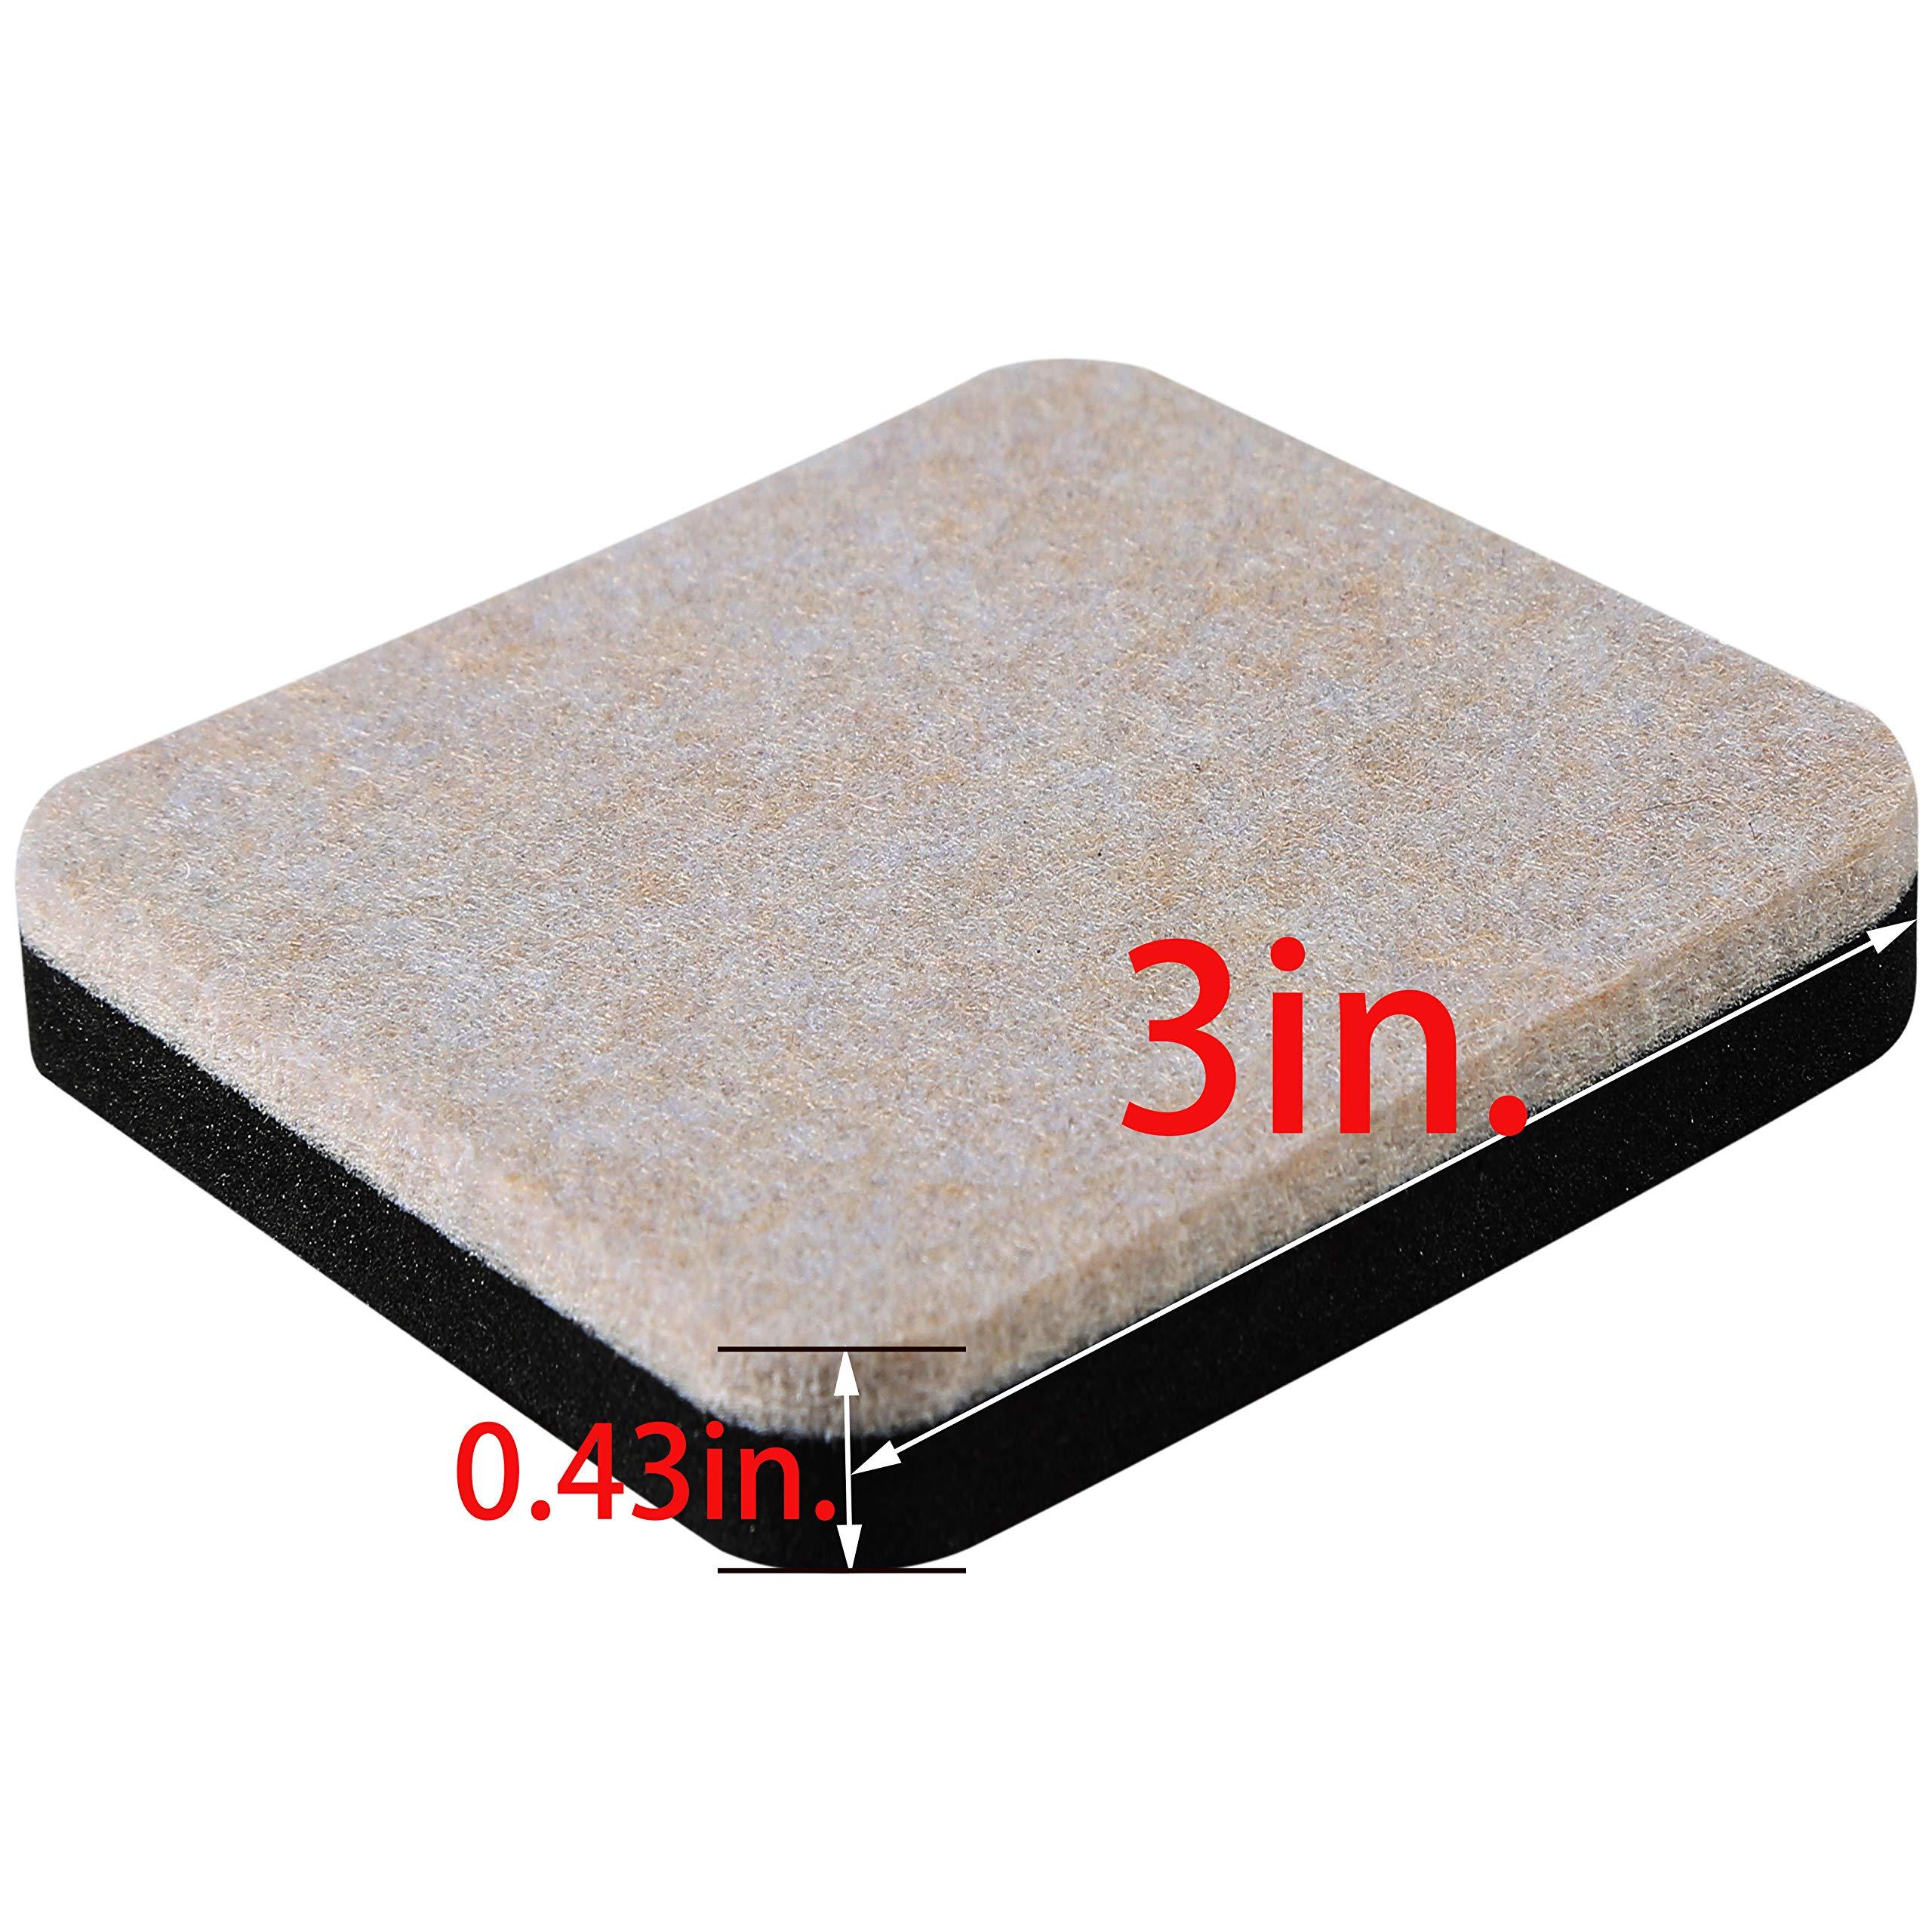 Liyic 20 Pack 3in.Square Felt Sliders for Hard Surfaces-Felt Furniture Sliders - Heavy Duty Sliders – Reusable Hardwood Floor Sliders -Furniture Moving Sliders-Sofa Sliders Gliders Glides Movers by Liyic (Image #2)